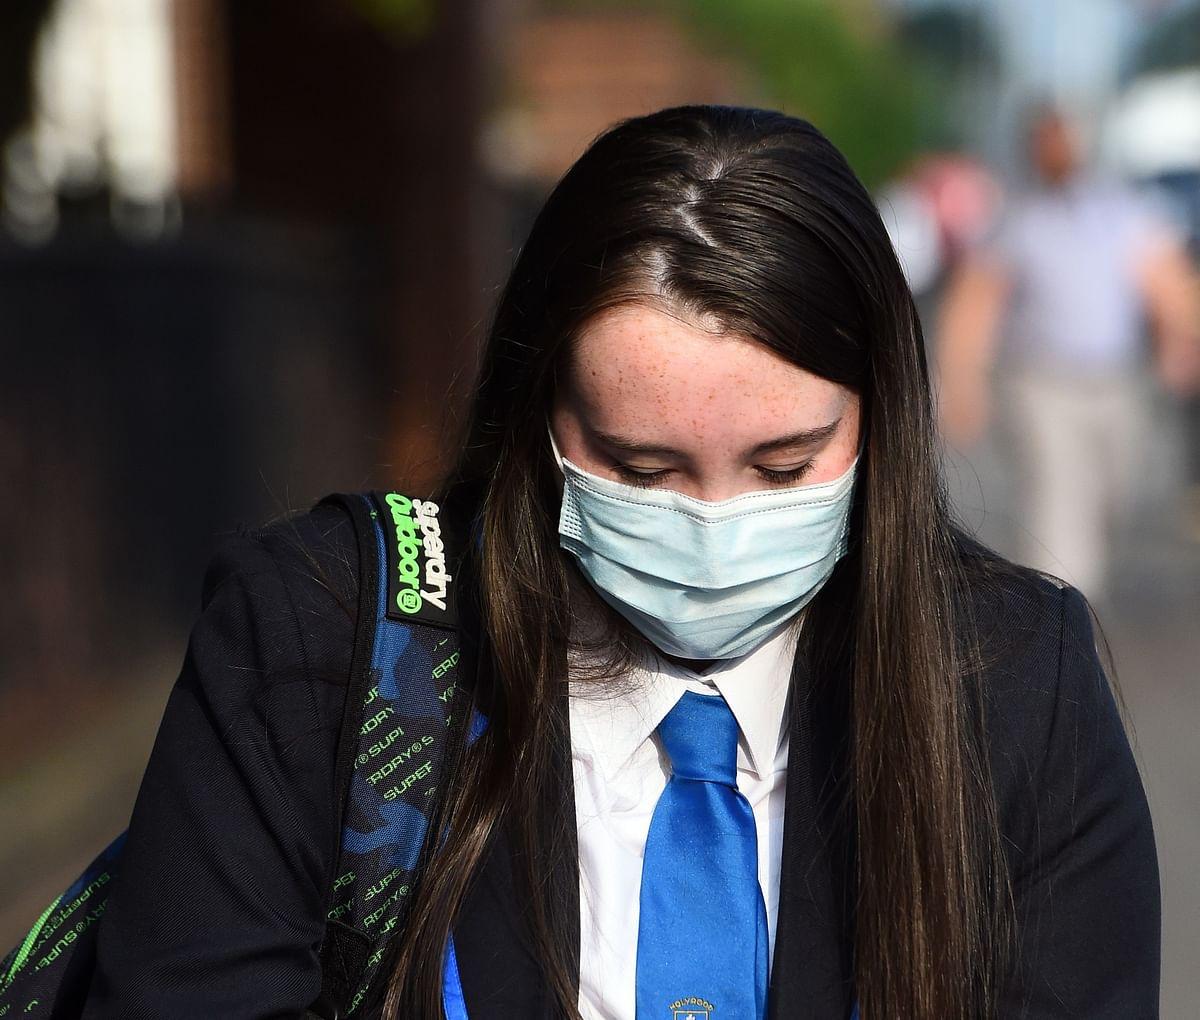 England makes face masks compulsory in schools